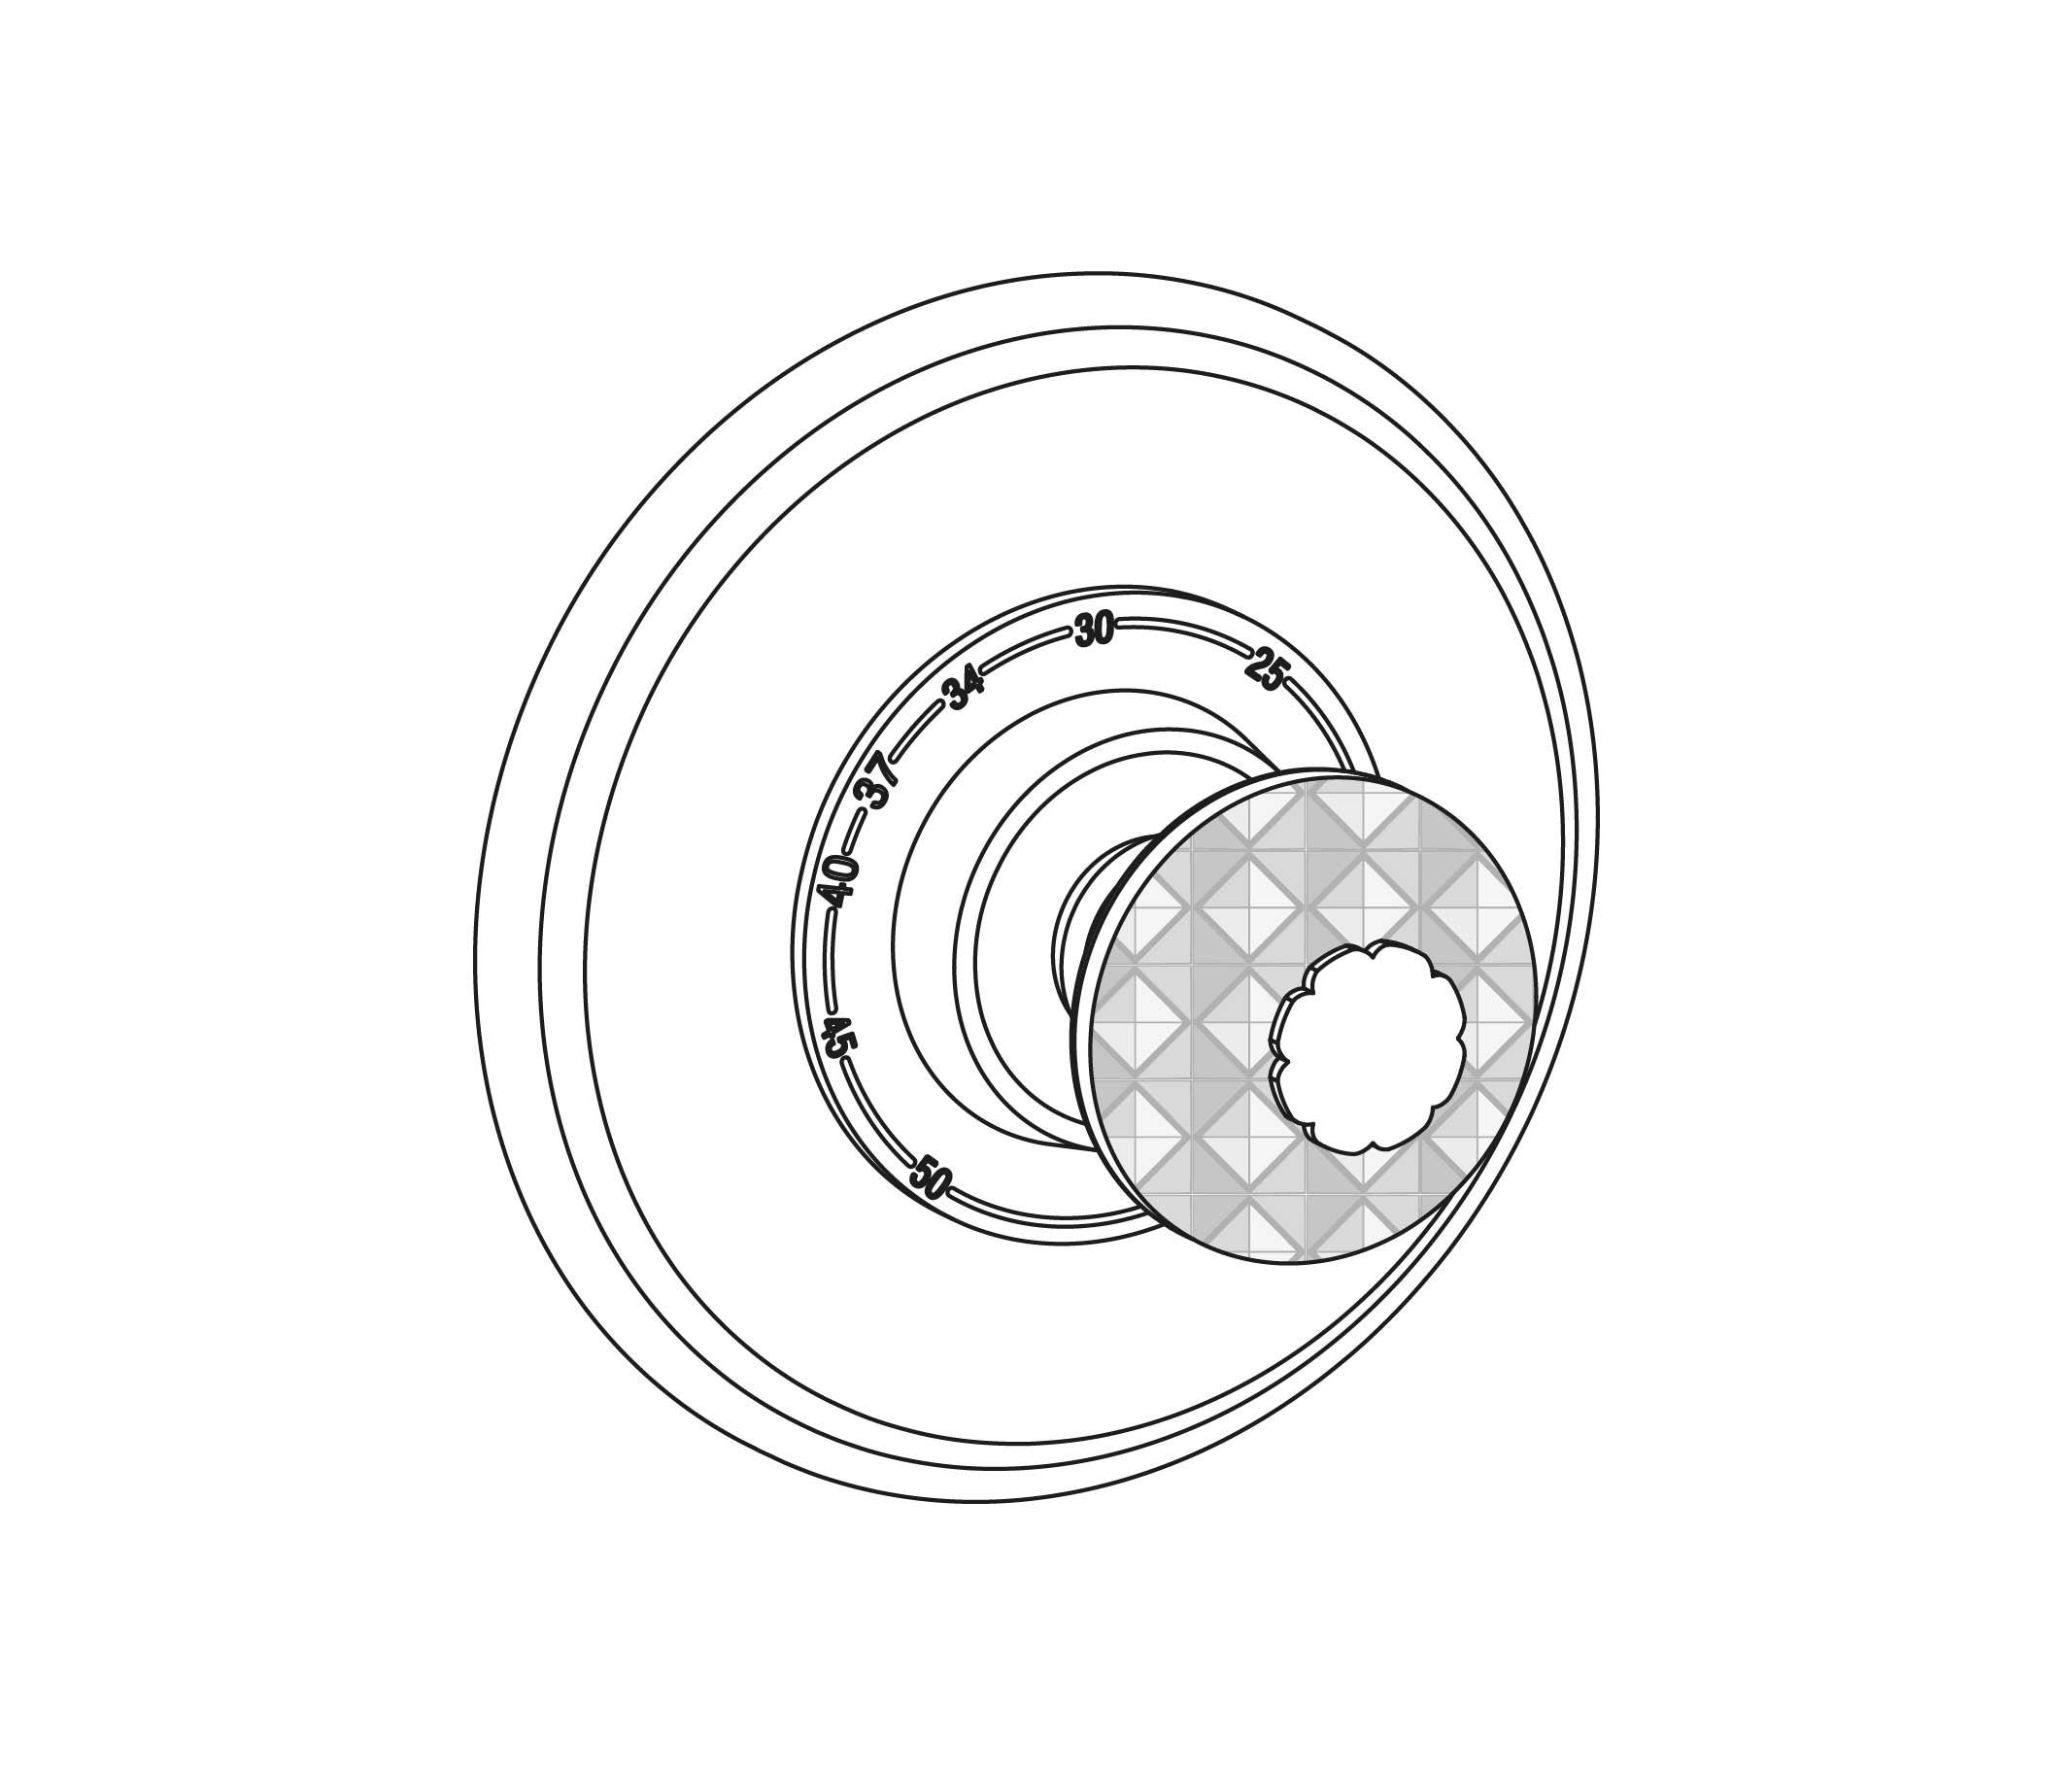 c46-2r1 plaque ronde ø150mm